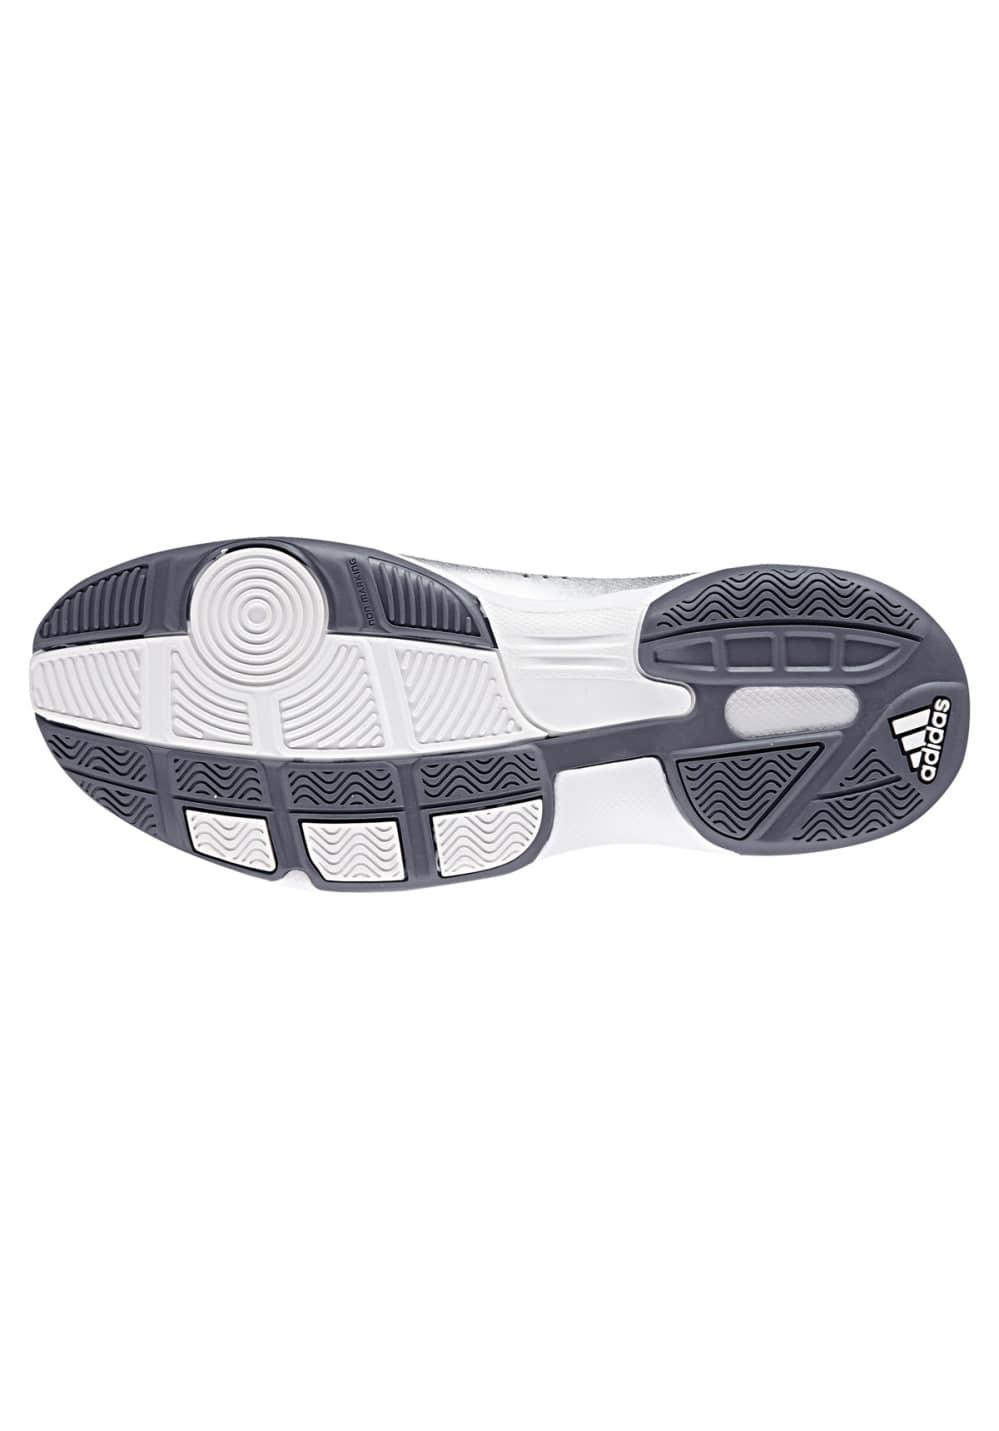 Essence Handballschuhe Für Adidas Grau Herren rWdBeCxo